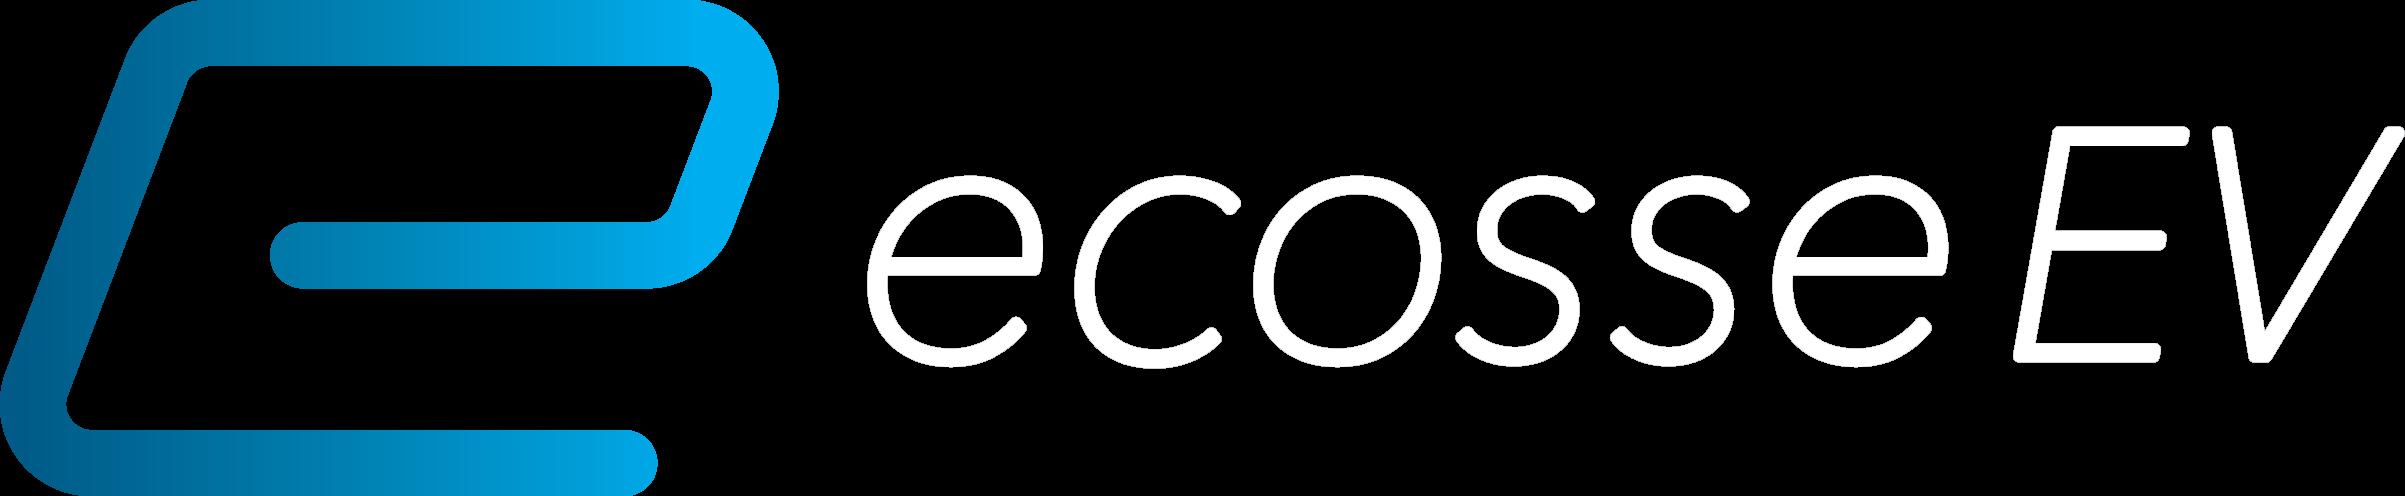 Ecosse EV